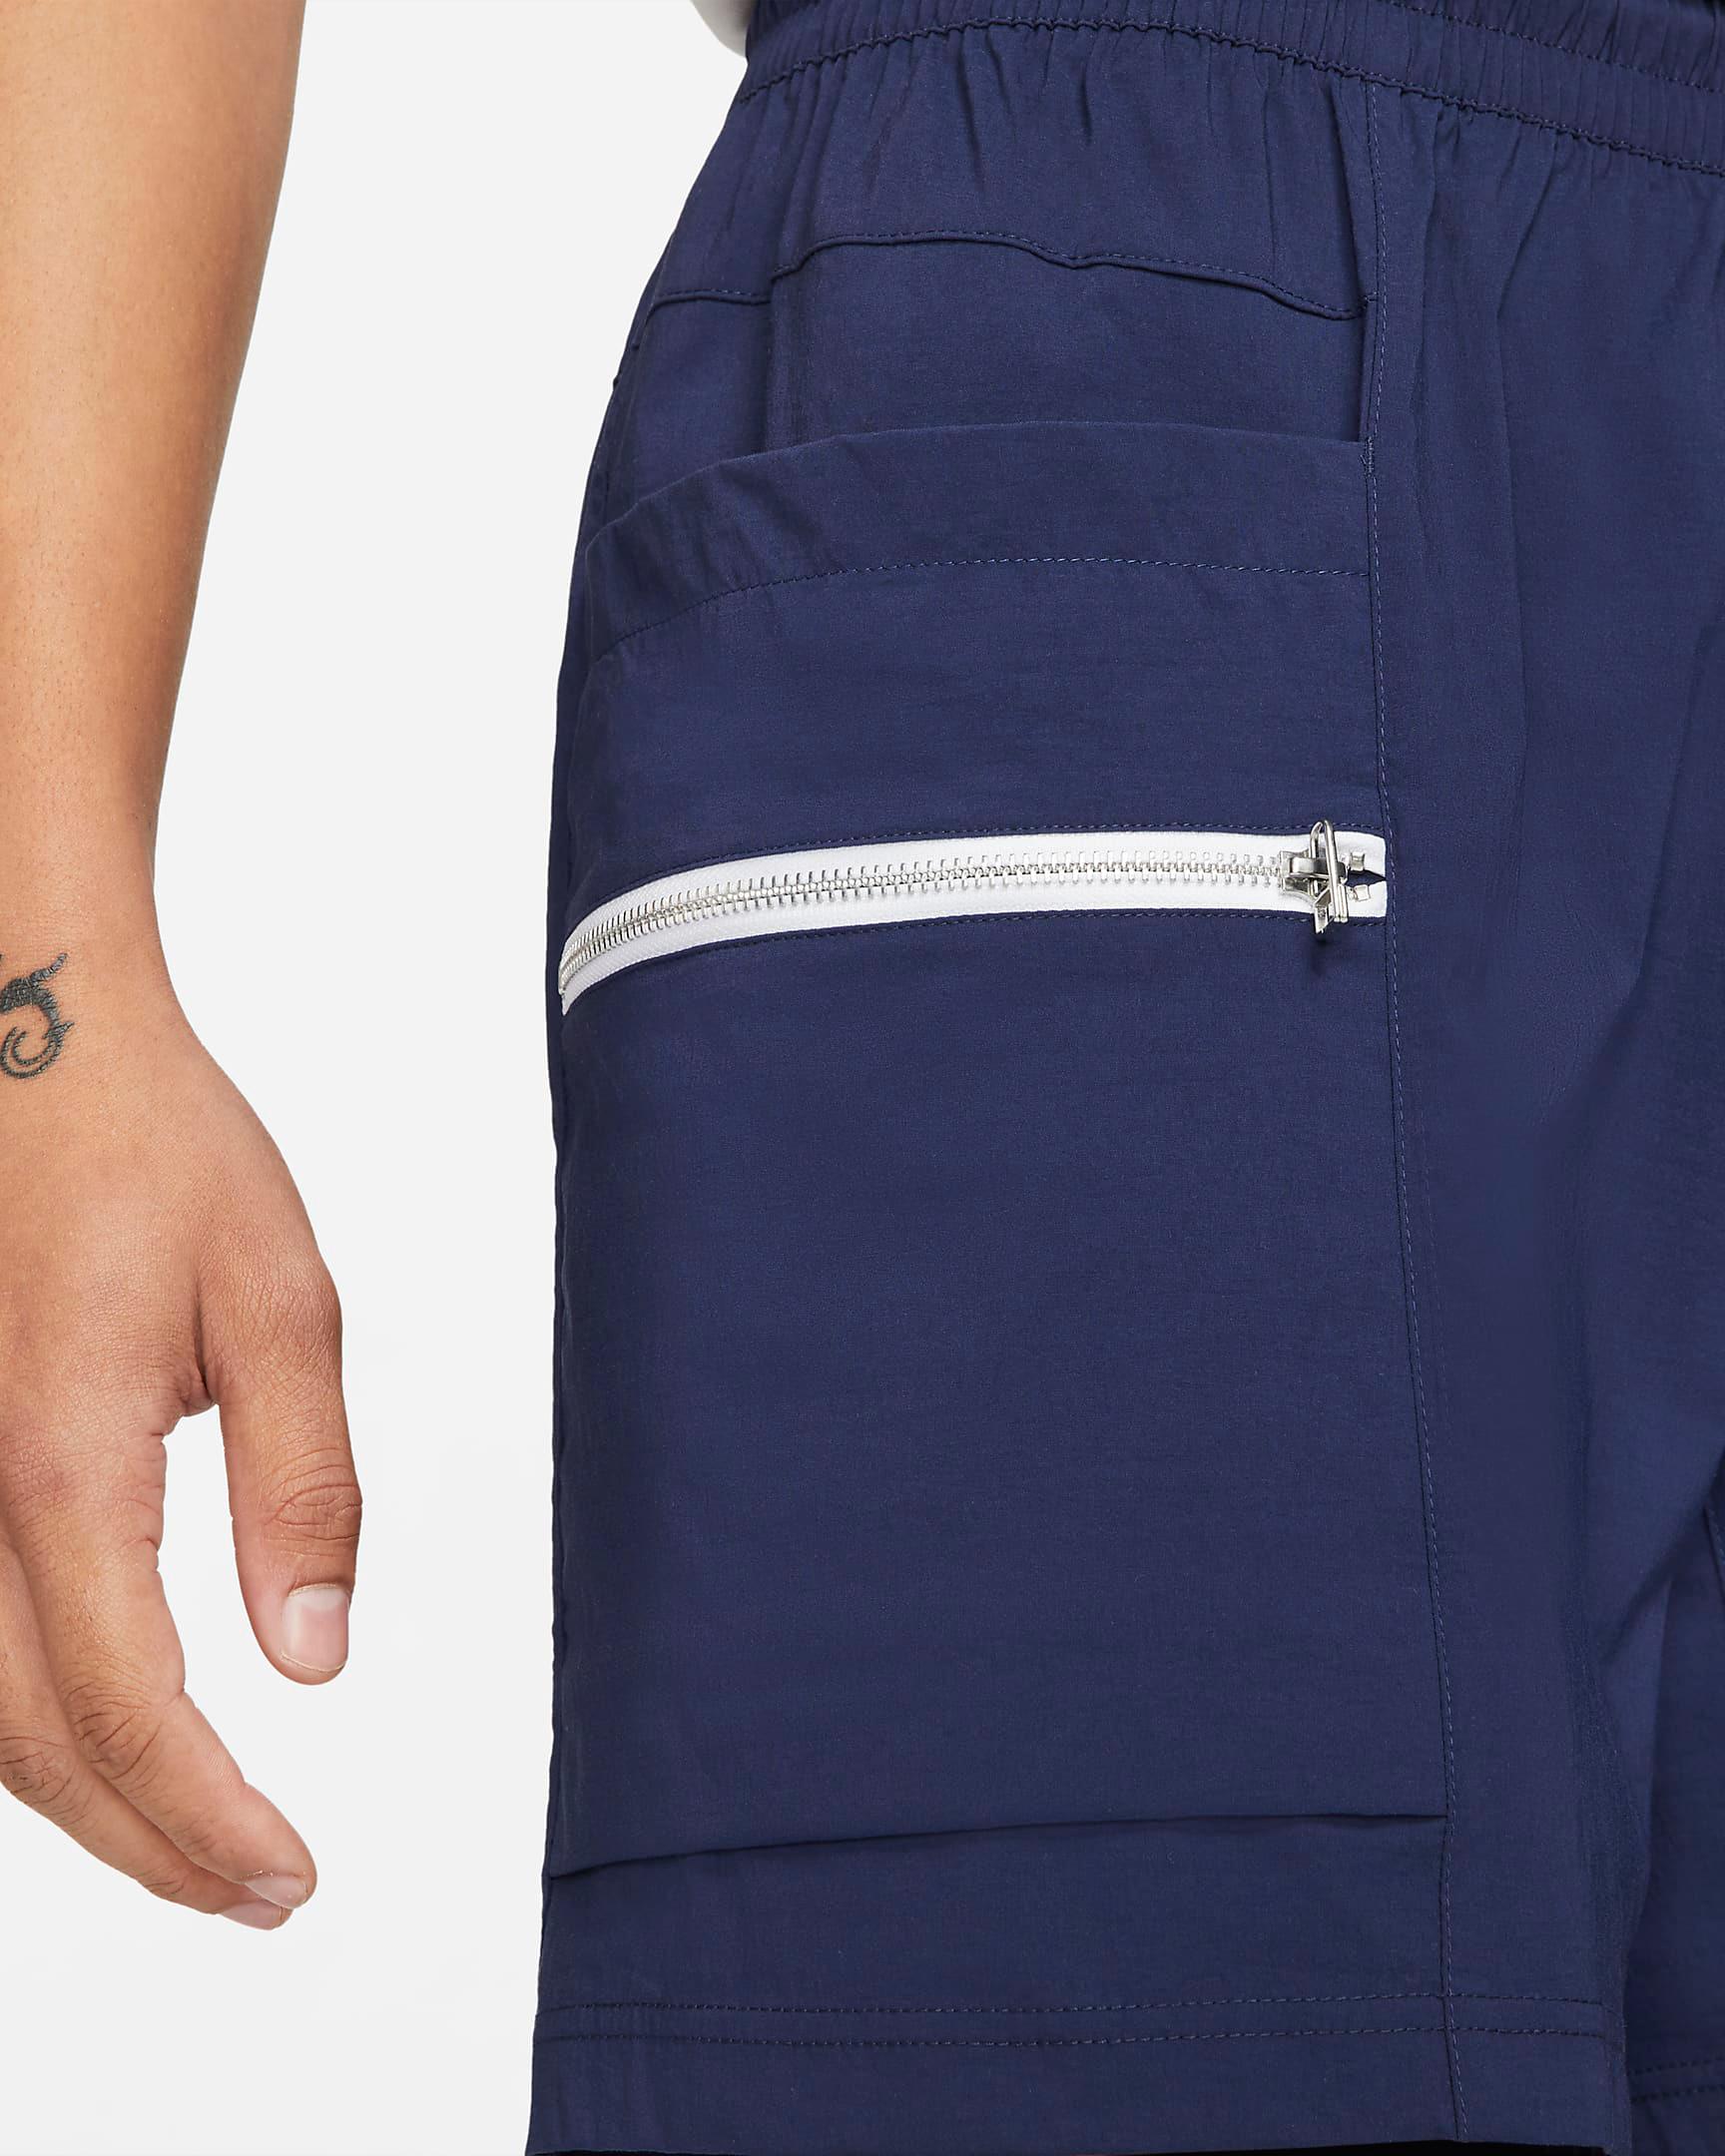 nike-midnight-navy-modern-woven-shorts-3